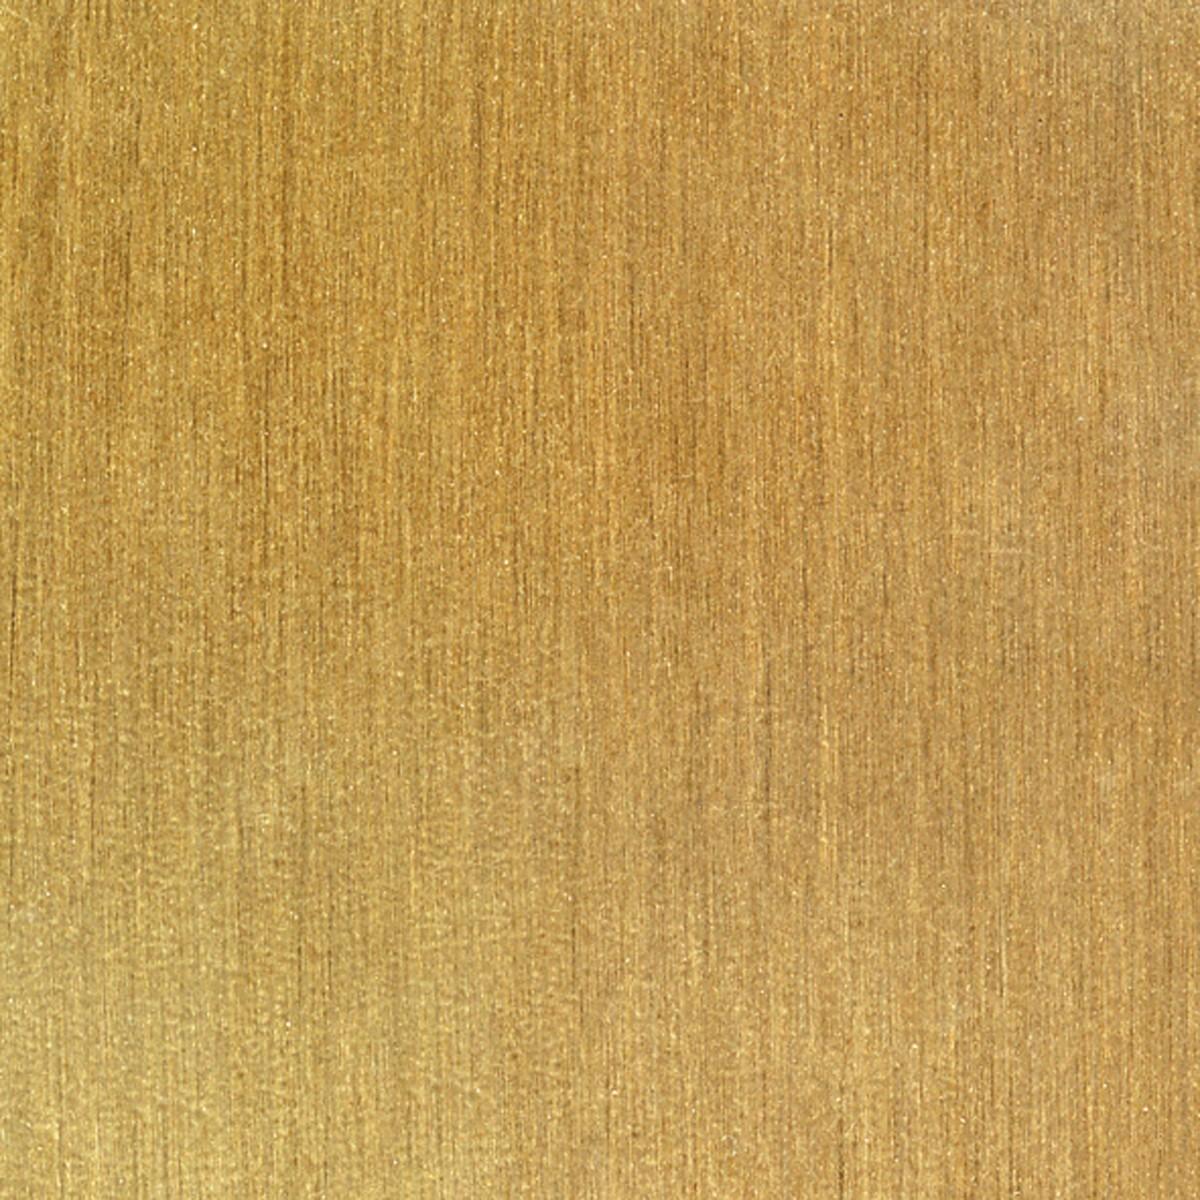 Holtkötter Leuchten Epsilon Pendelleuchte, Länge: 59 cm, Eloxal Messing